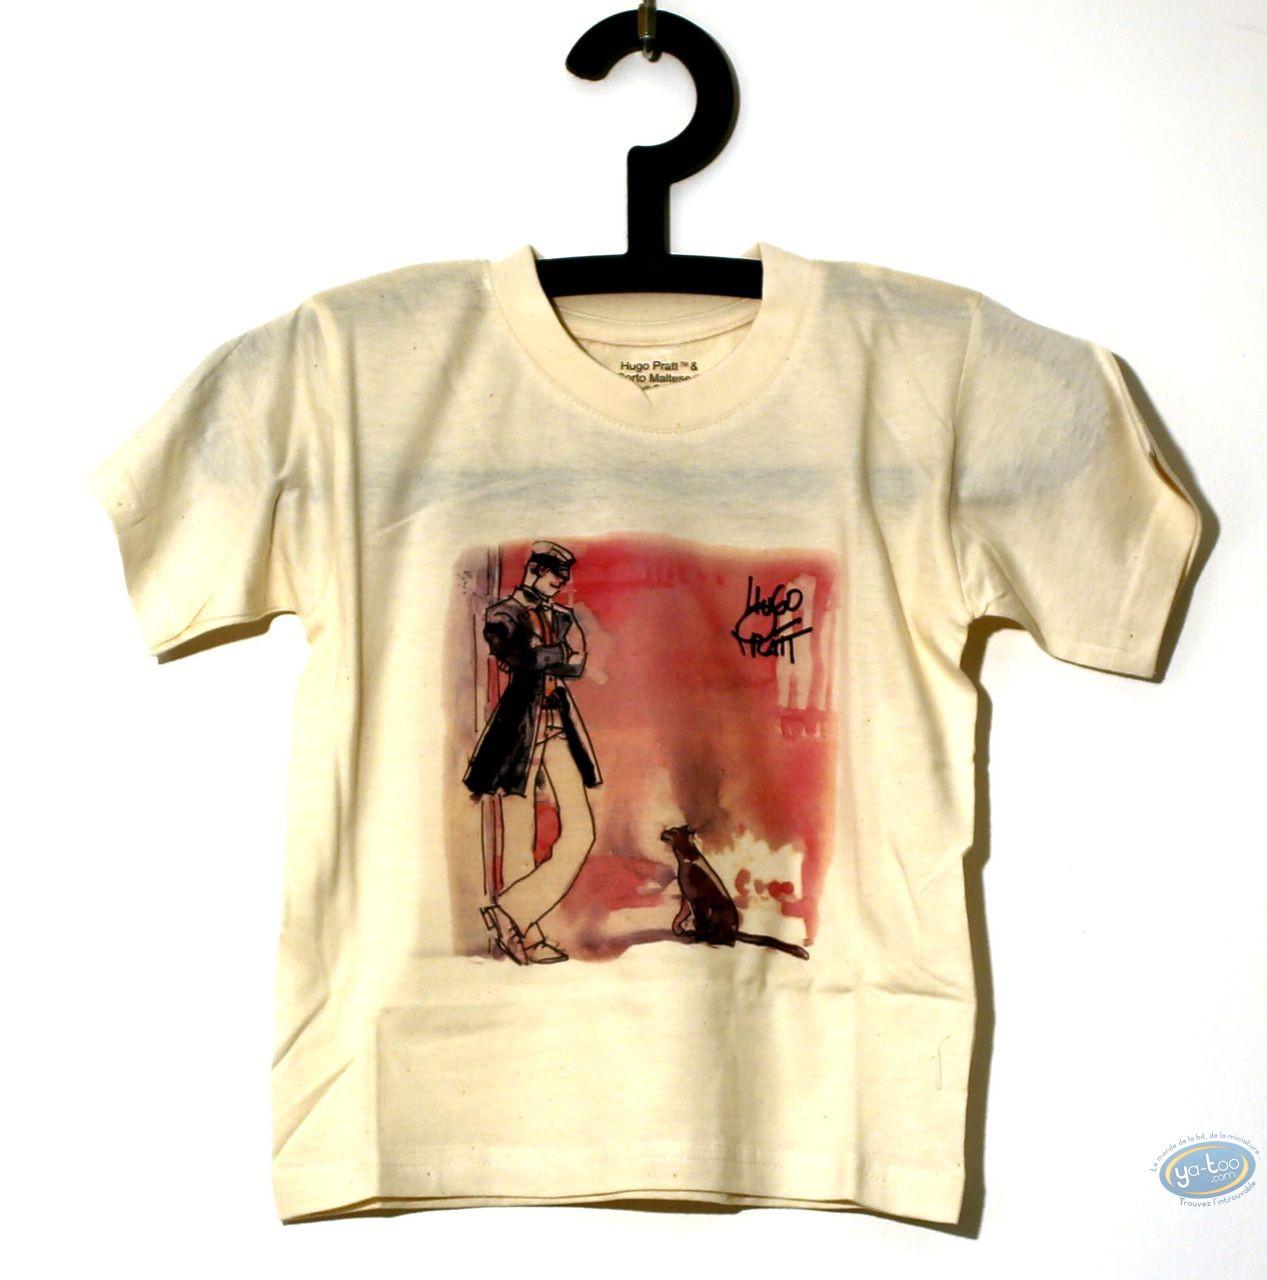 Clothes, Corto Maltese : T-shirt, Corto Maltese : Kid 08/01 - 5/6 years